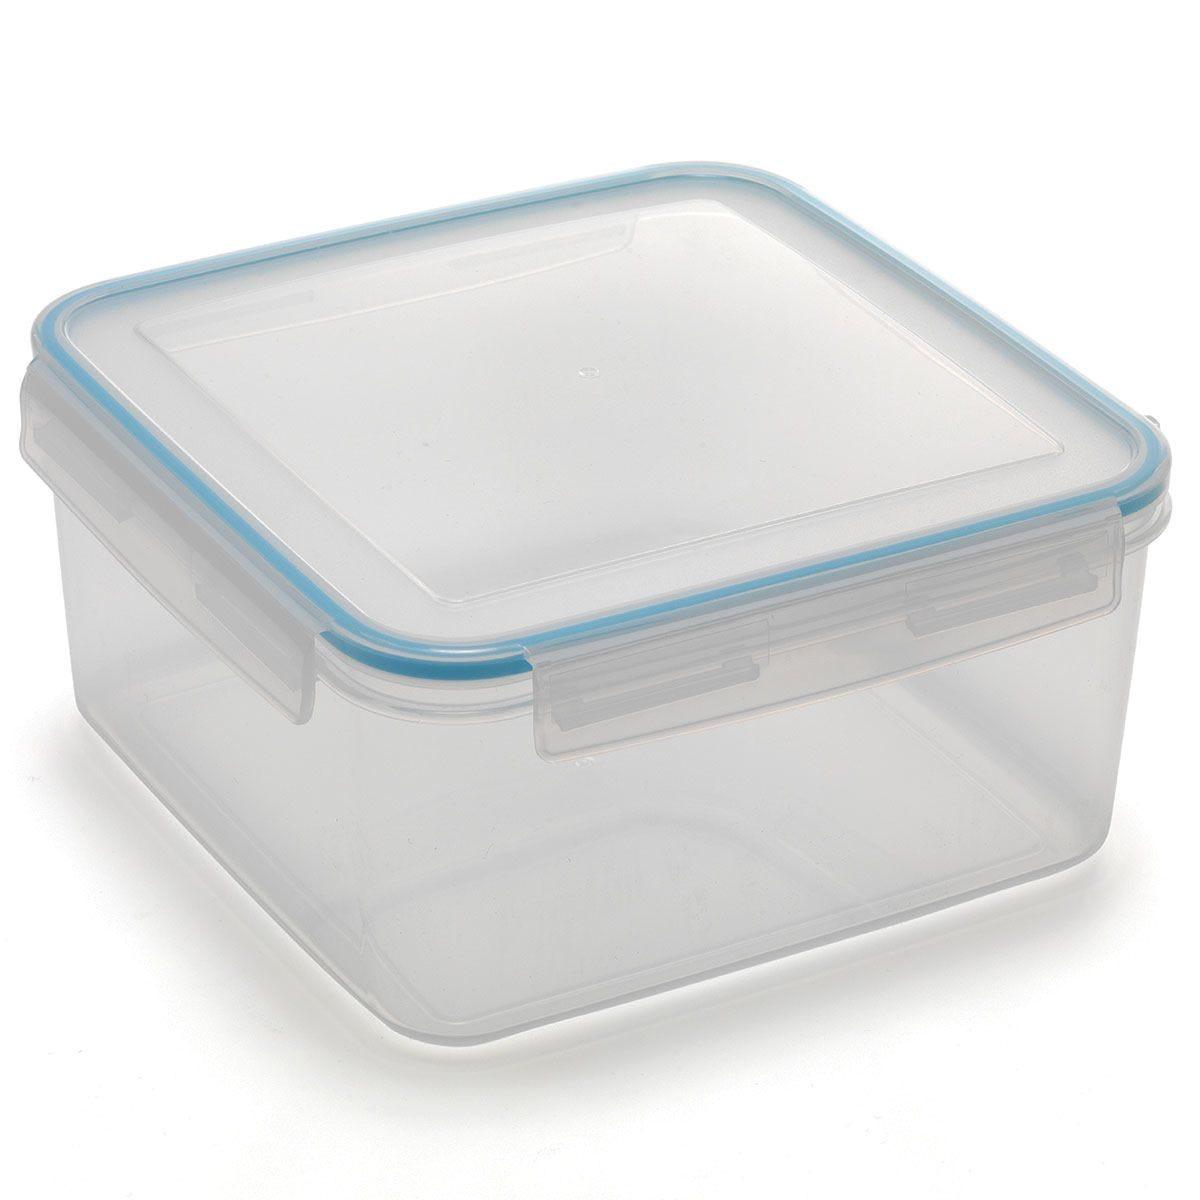 Addis Clip & Close Square Cake Container - 5L